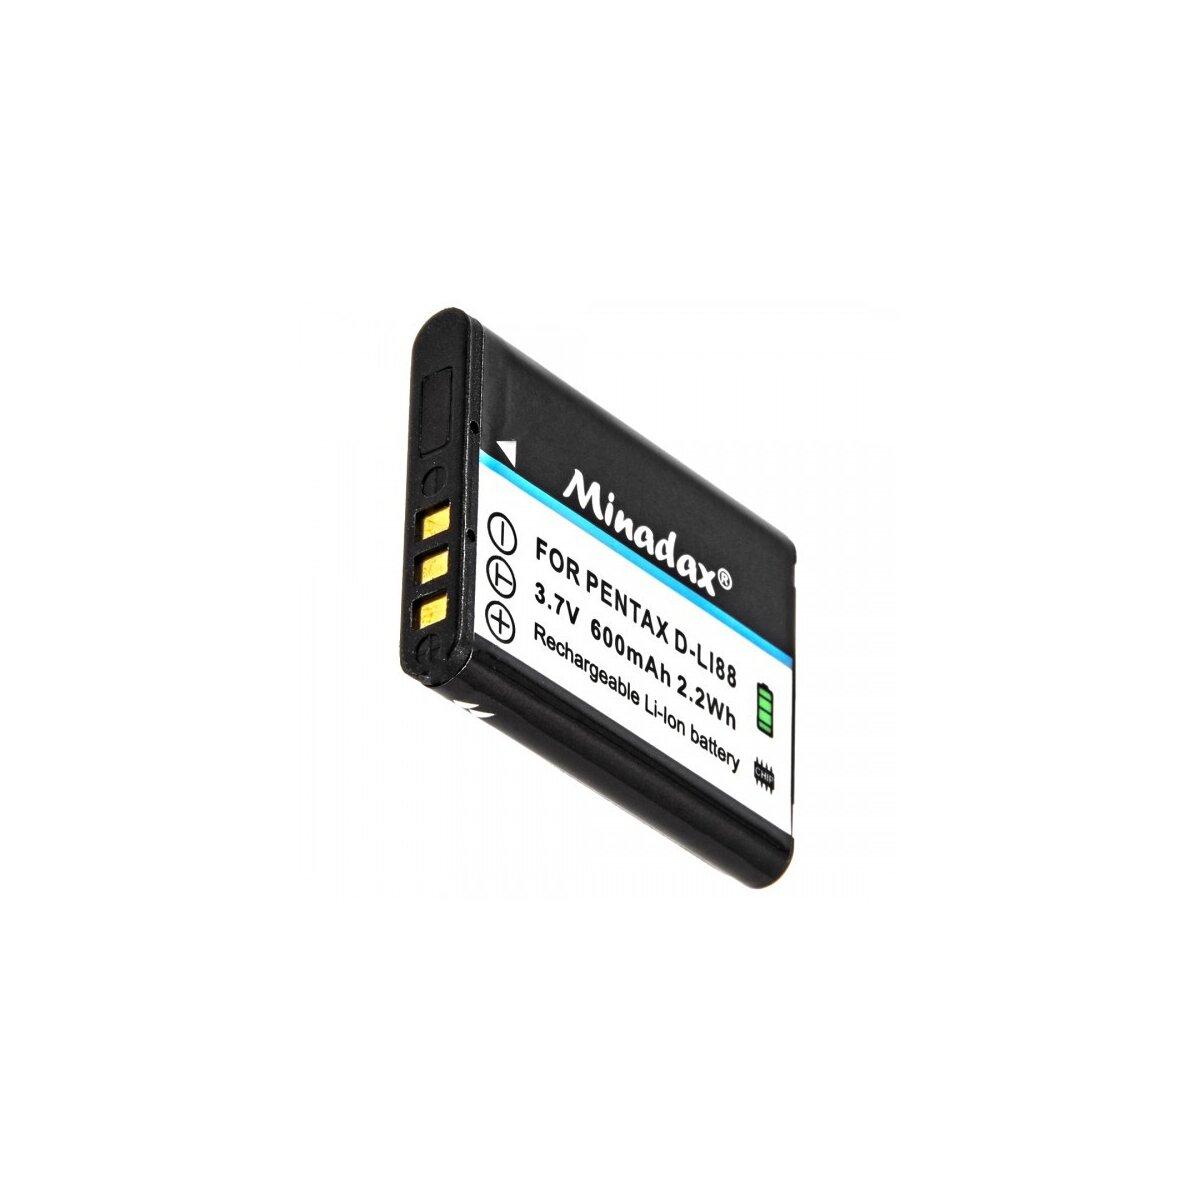 Minadax® Qualitaetsakku mit echten 600 mAh fuer Pentax Optio E71 H90 P70 P80 W90 WS80, wie D-LI88 - Intelligentes Akkusystem mit Chip